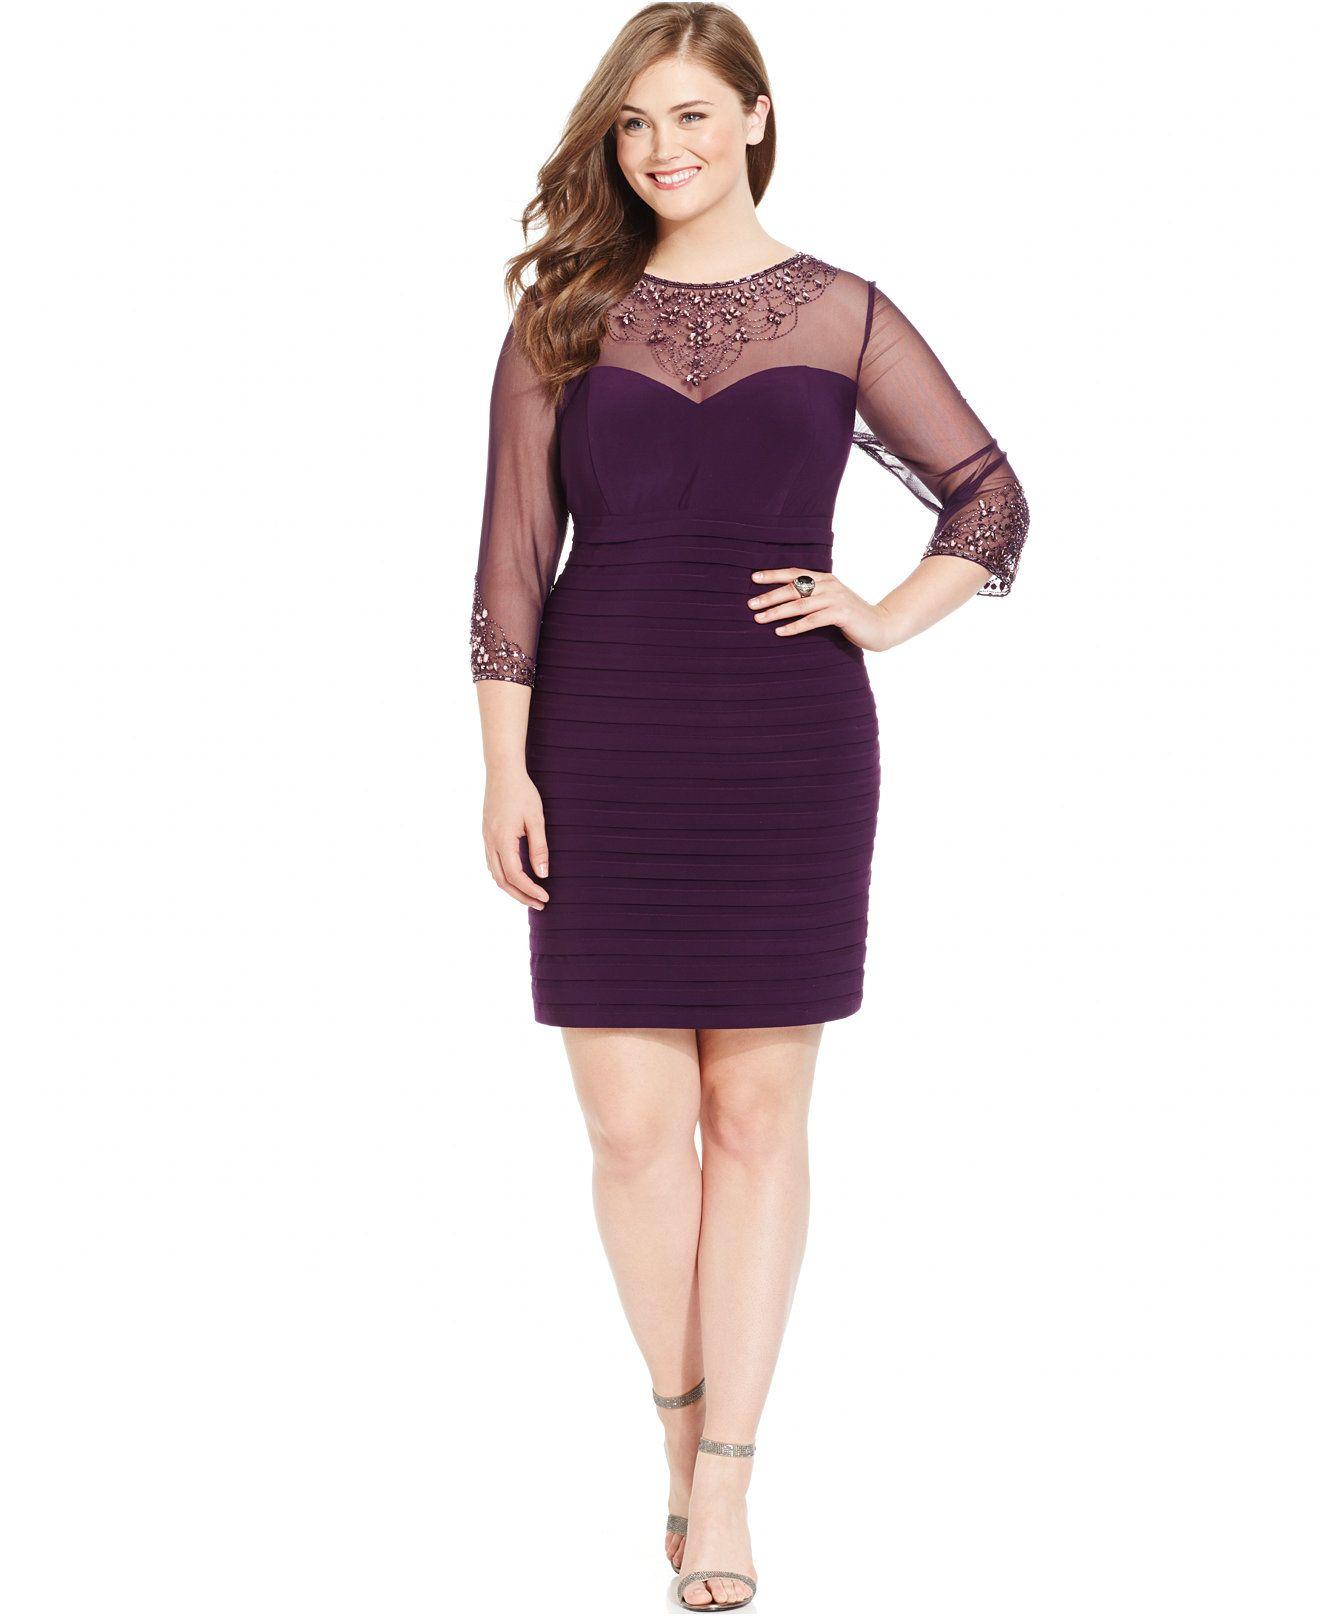 Plus Size Homecoming Dresses Belk - raveitsafe